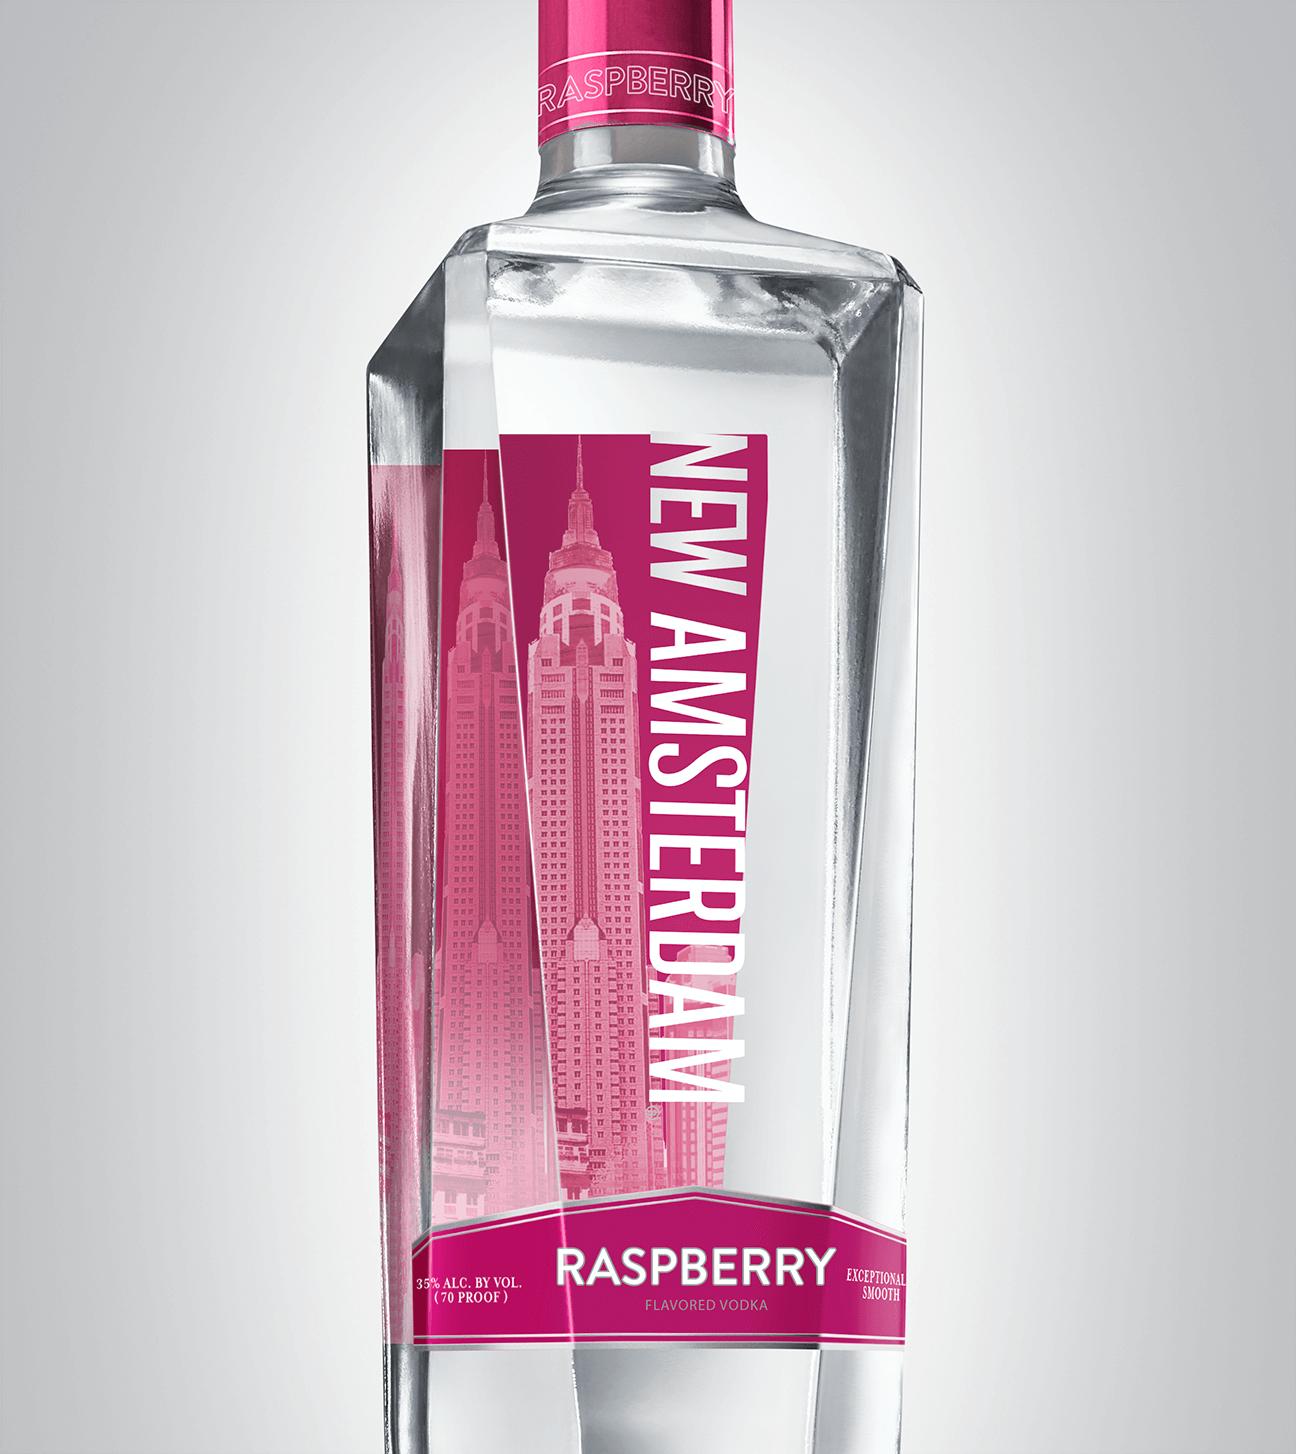 Bottle of New Amsterdam Raspberry